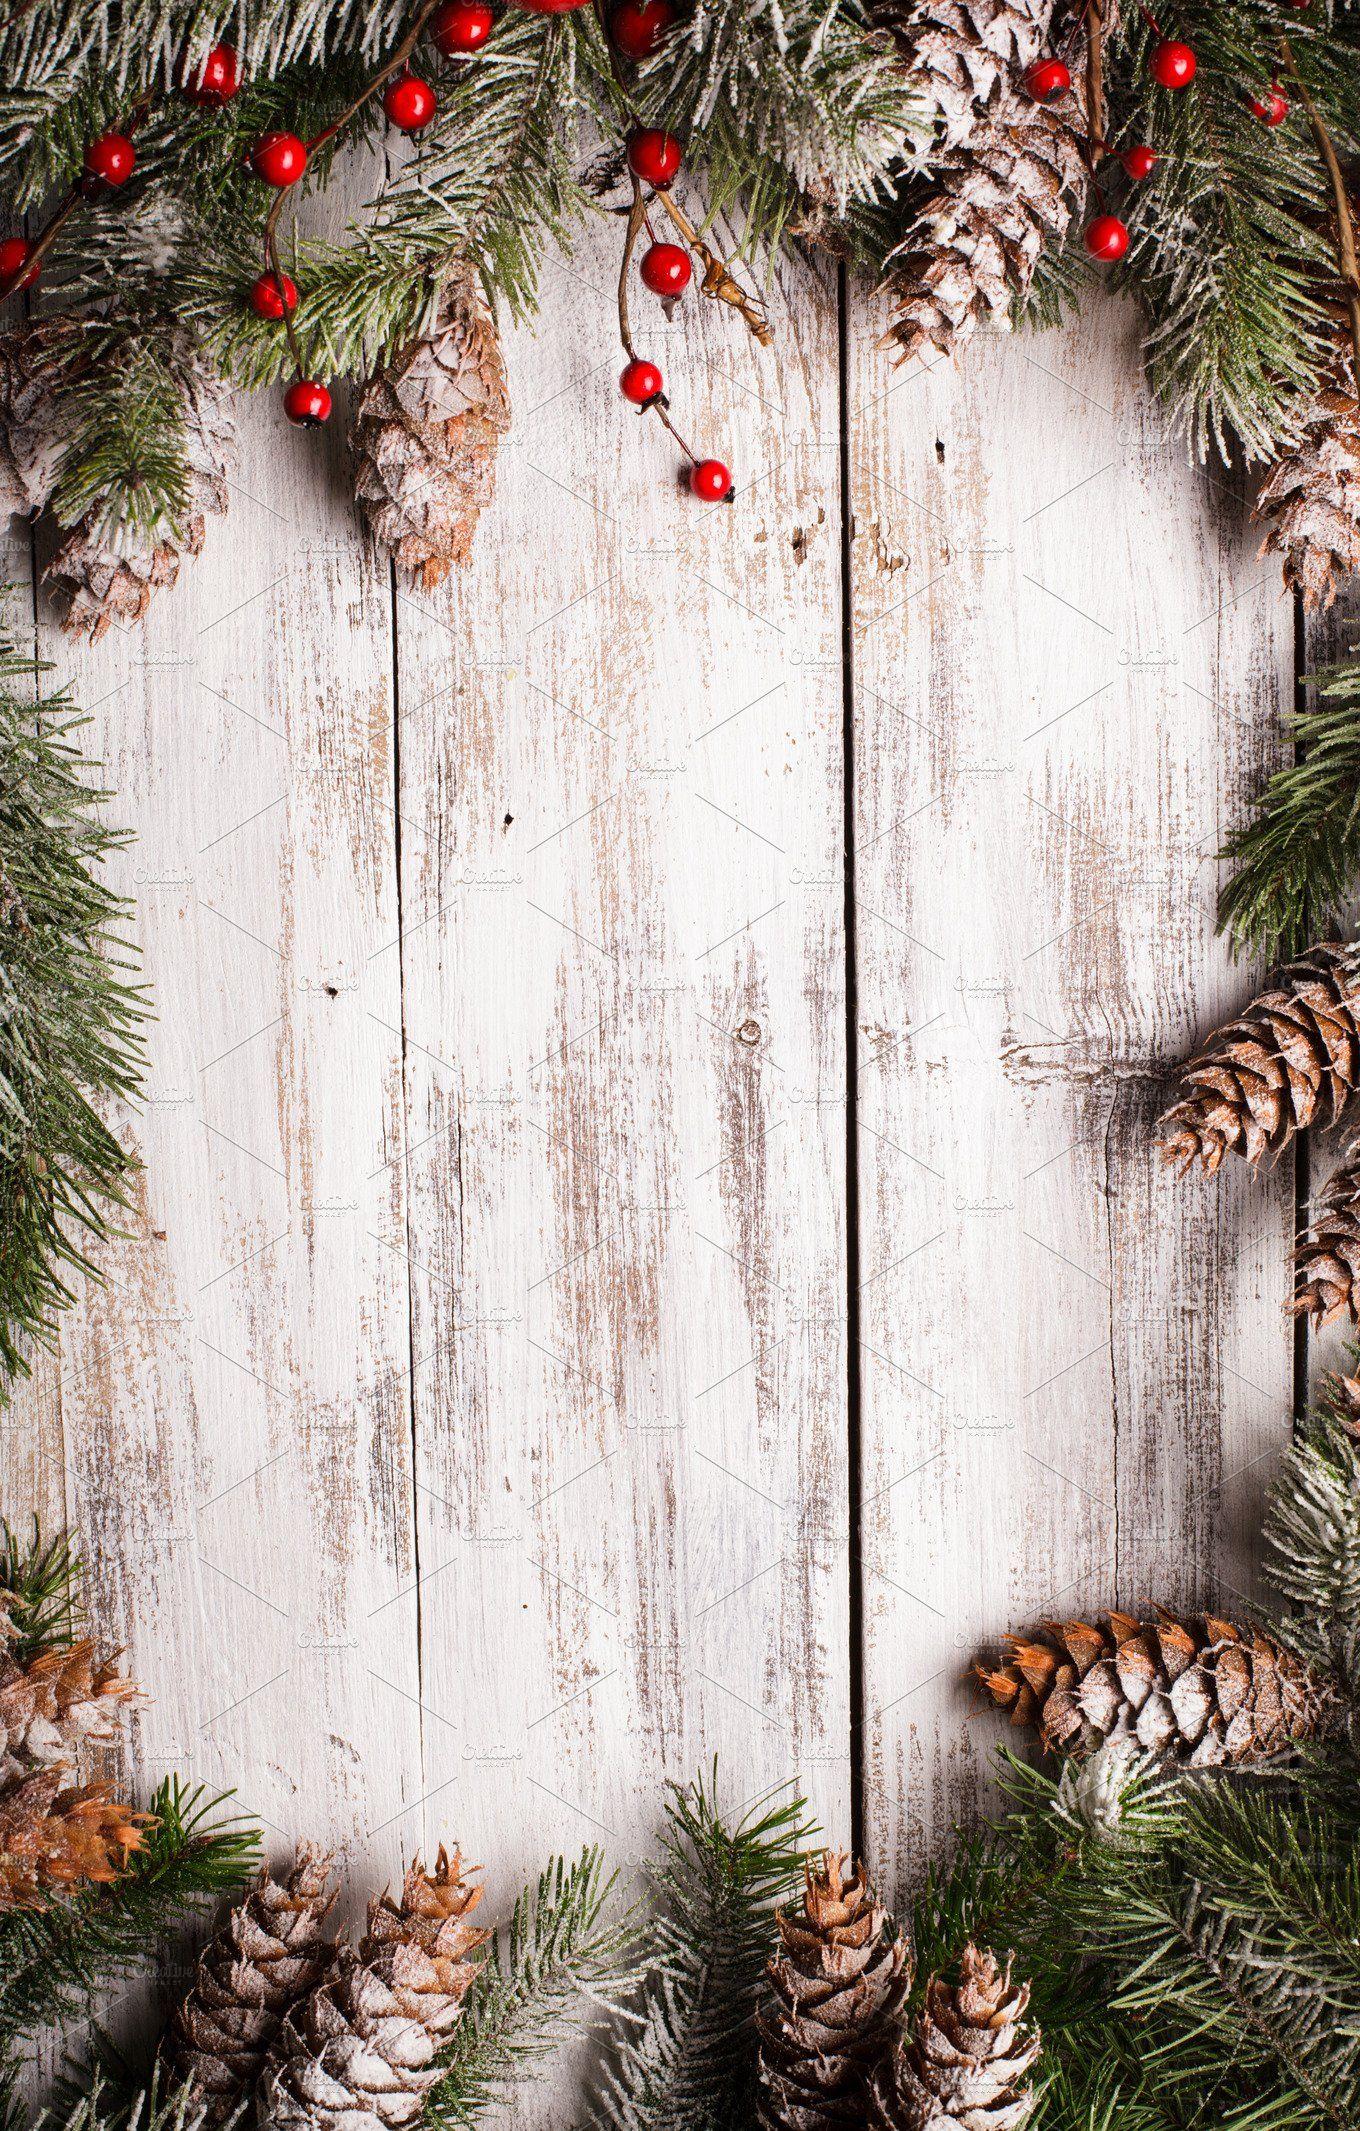 Holiday background by oksix on @creativemarket #christmasbackgrounds